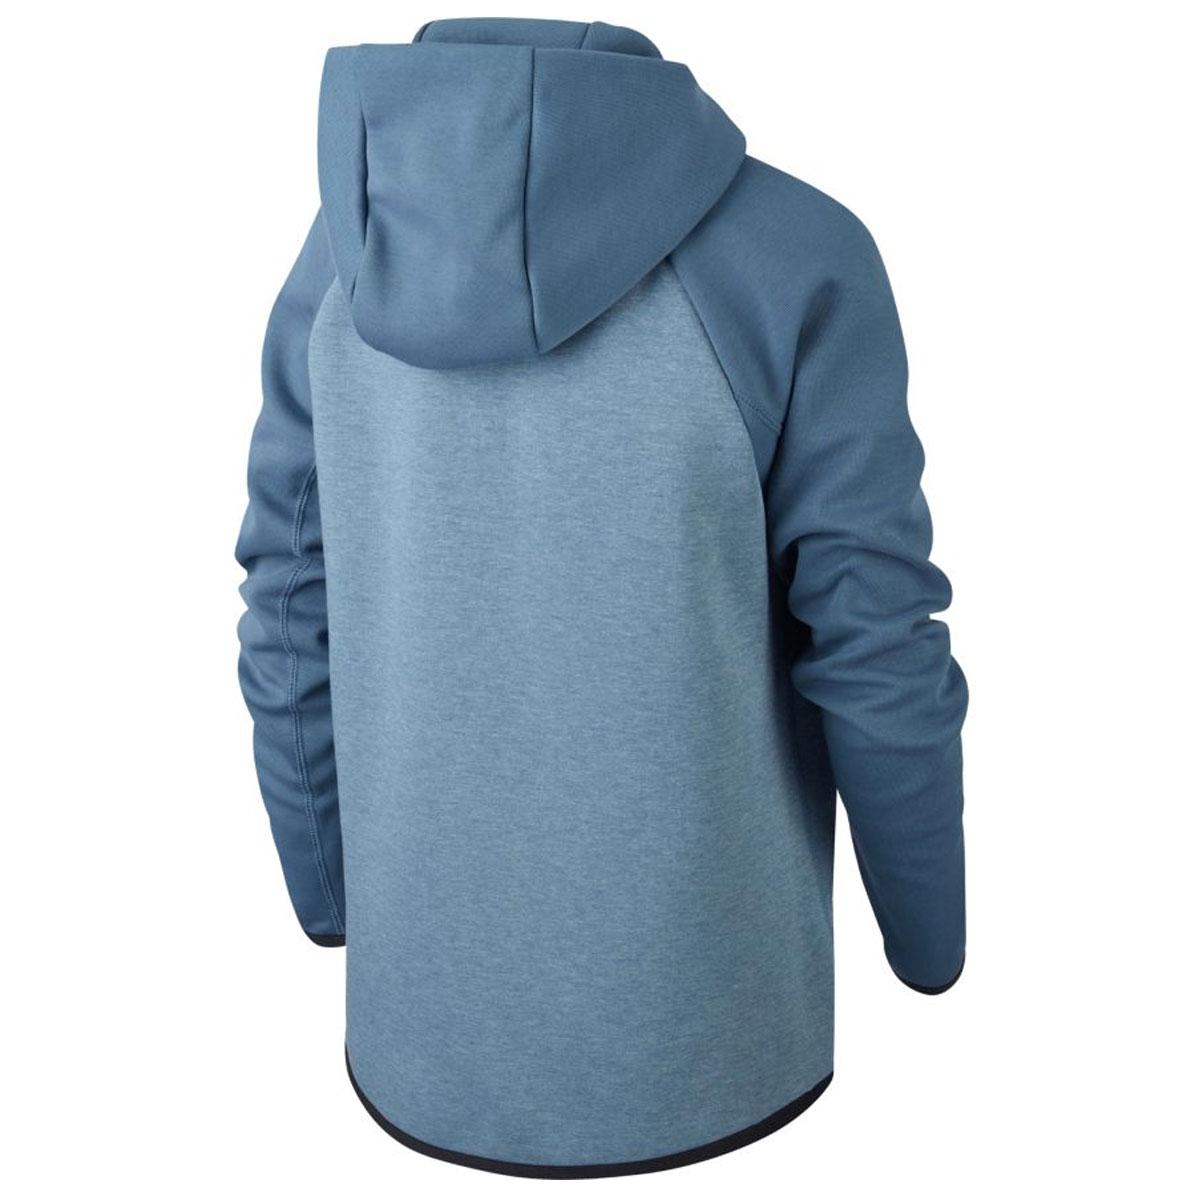 763aa19c737c Nike Tech Fleece Full Zip Hoodie Junior. AR4020 418 Thunderstorm Heather  Black White. Product afbeelding Product afbeelding